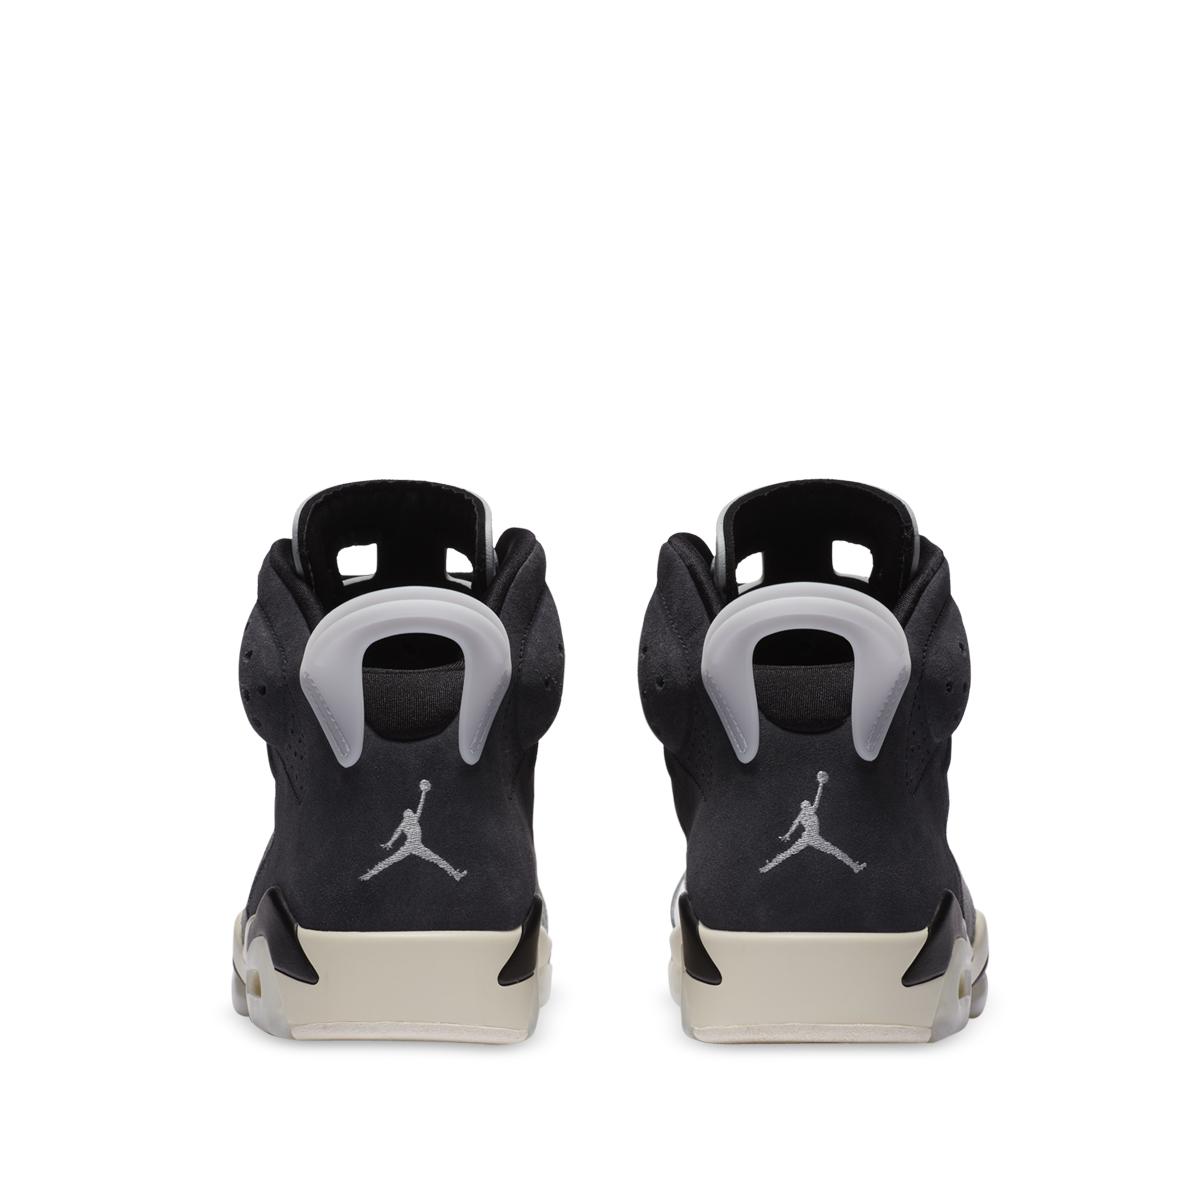 Nike Womens Air Jordan 6 'Chrome'